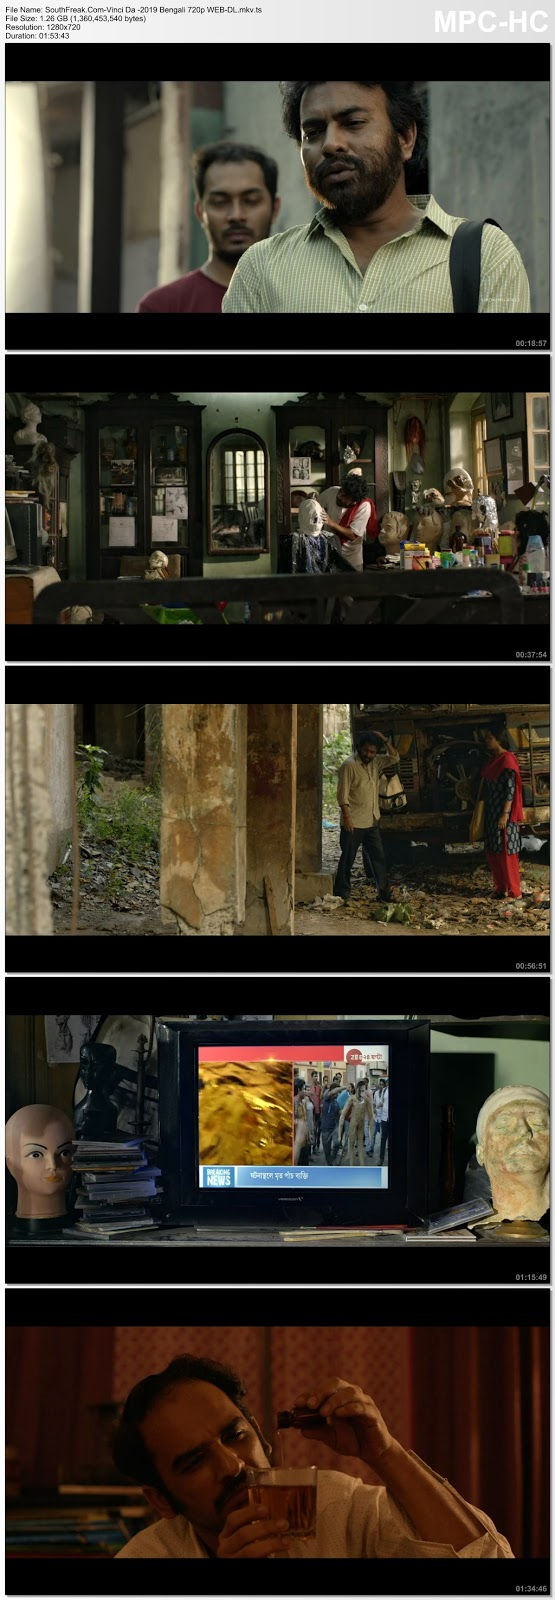 Vinci Da 2019 Bengali Full Movie 480p  WEB DL 400MB | 720p WEB DL 1.3GB With Google Drived Link (southfreak1.tk)